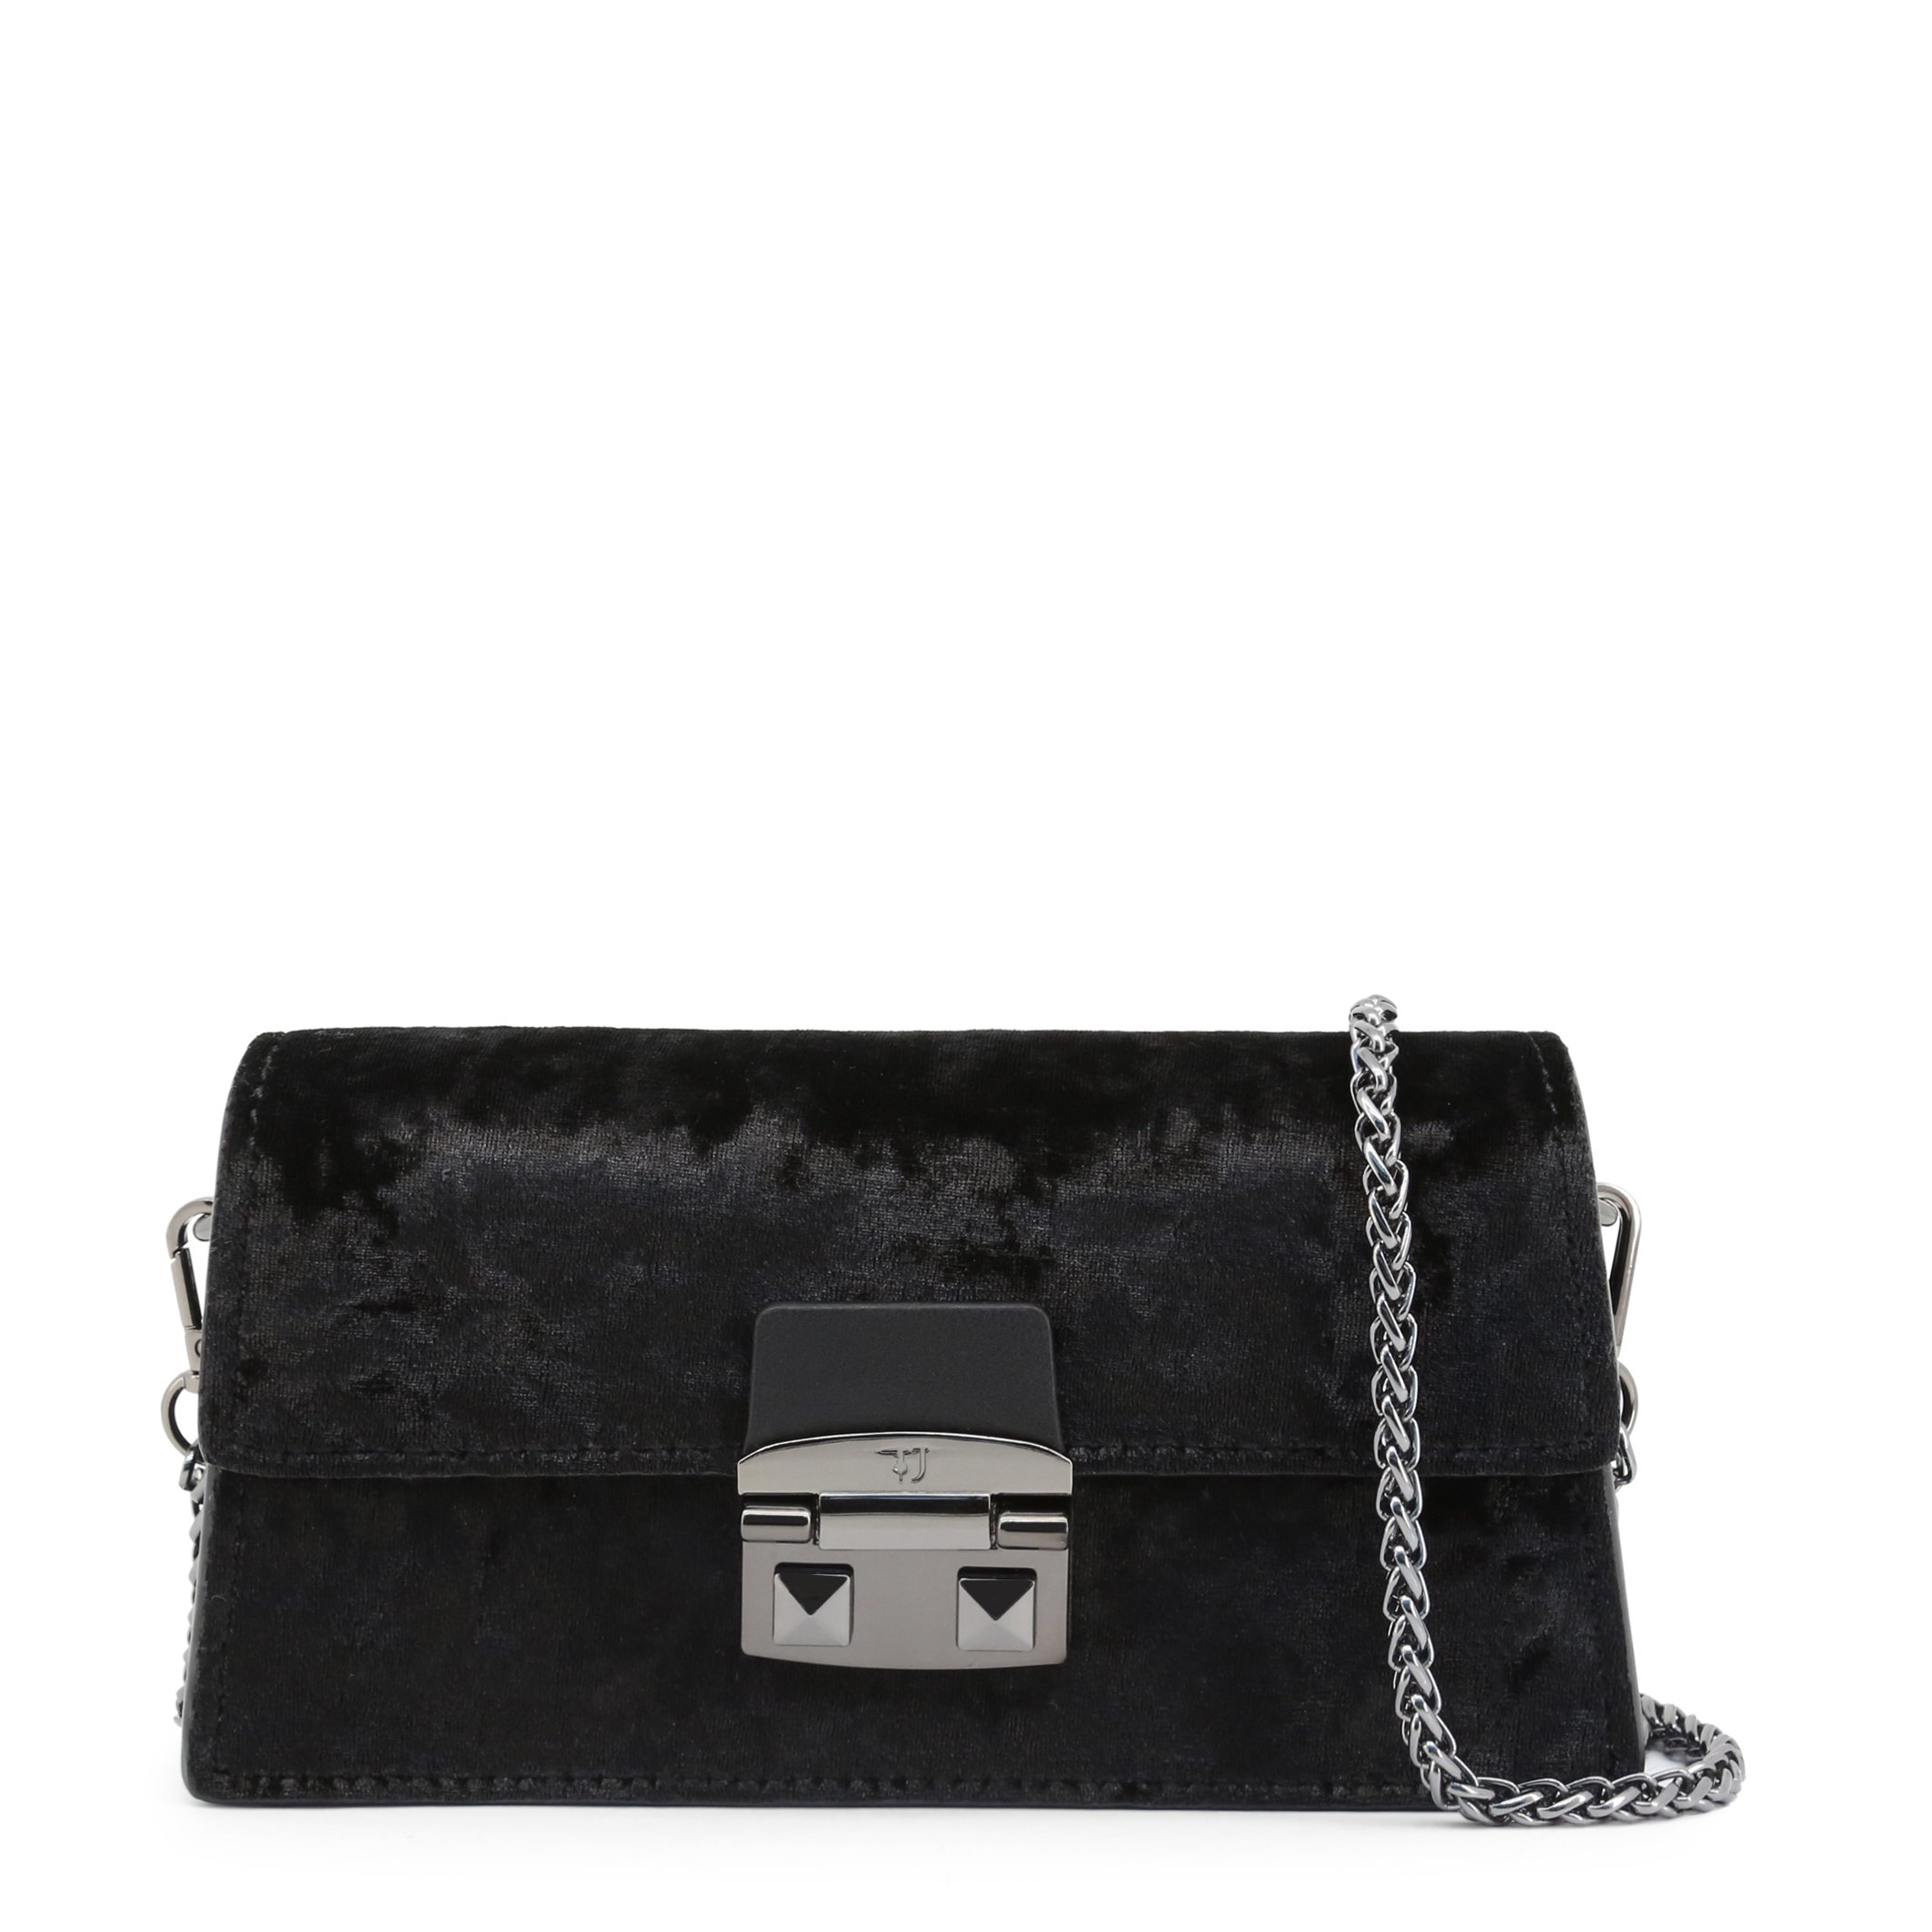 Trussardi Women's Clutch Bag Various Colours CORIANDOLO_75B00554 - black NOSIZE